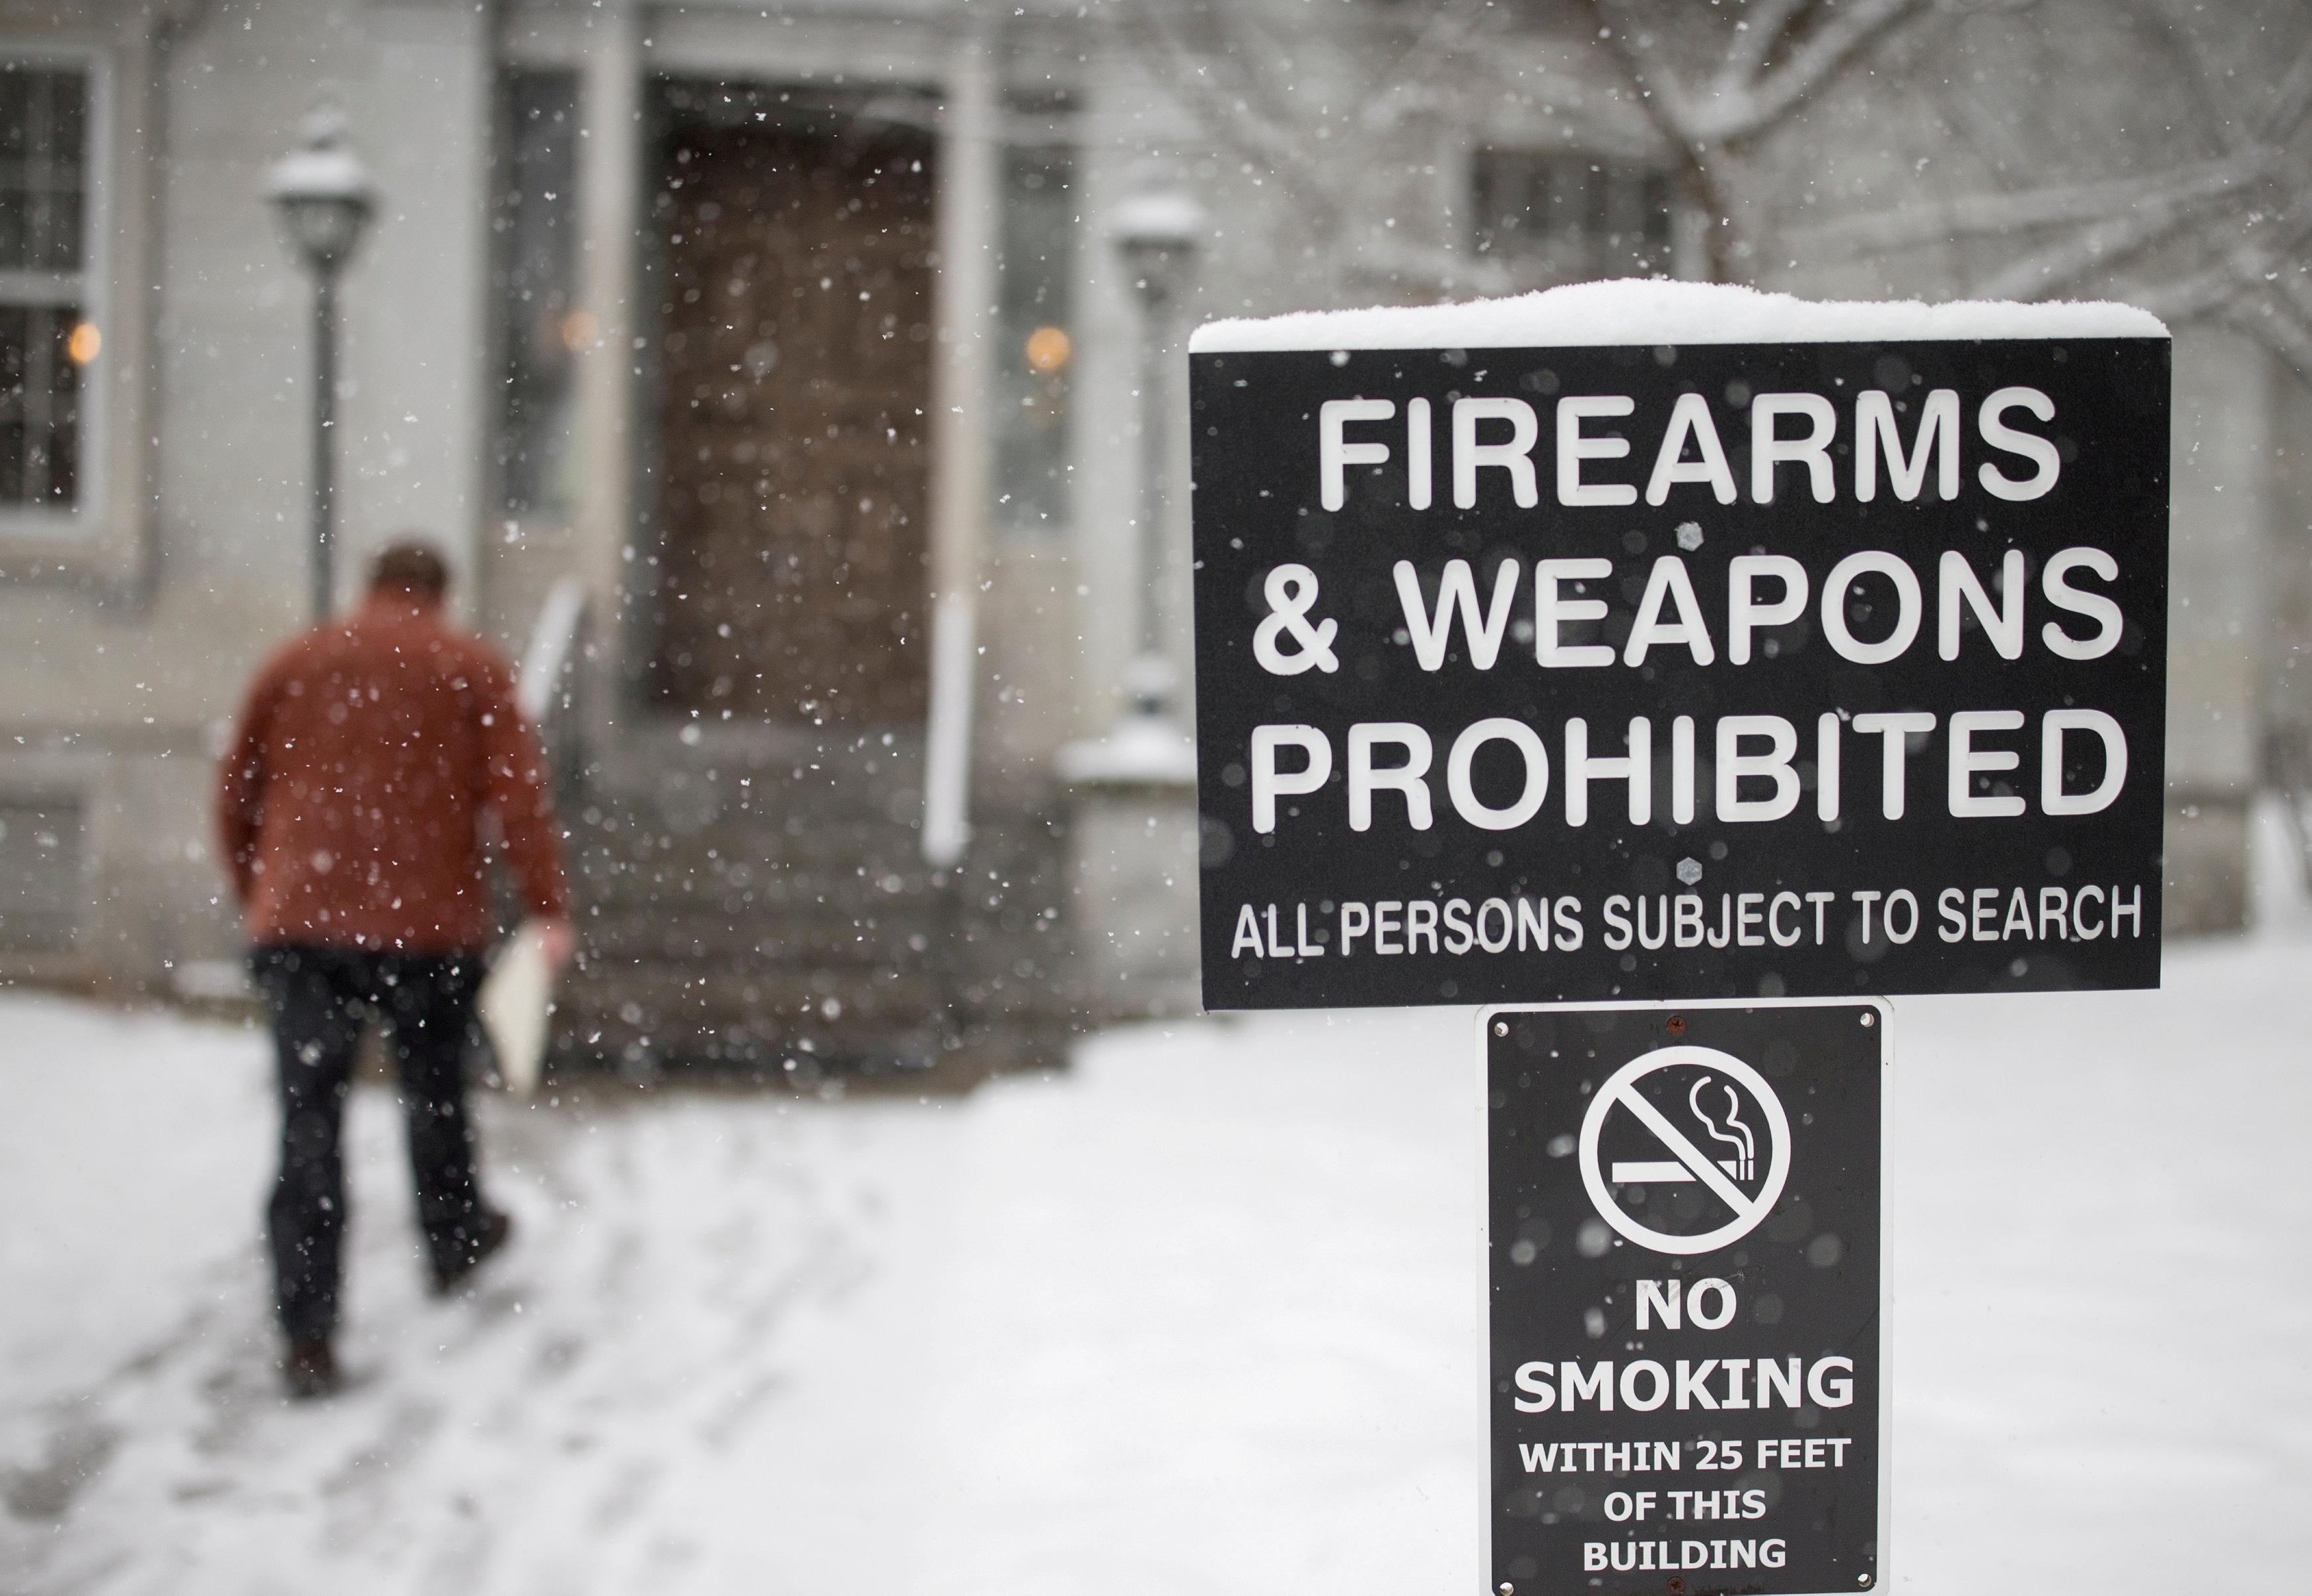 In gun-friendly Vermont, lawmakers pass firearms control bill